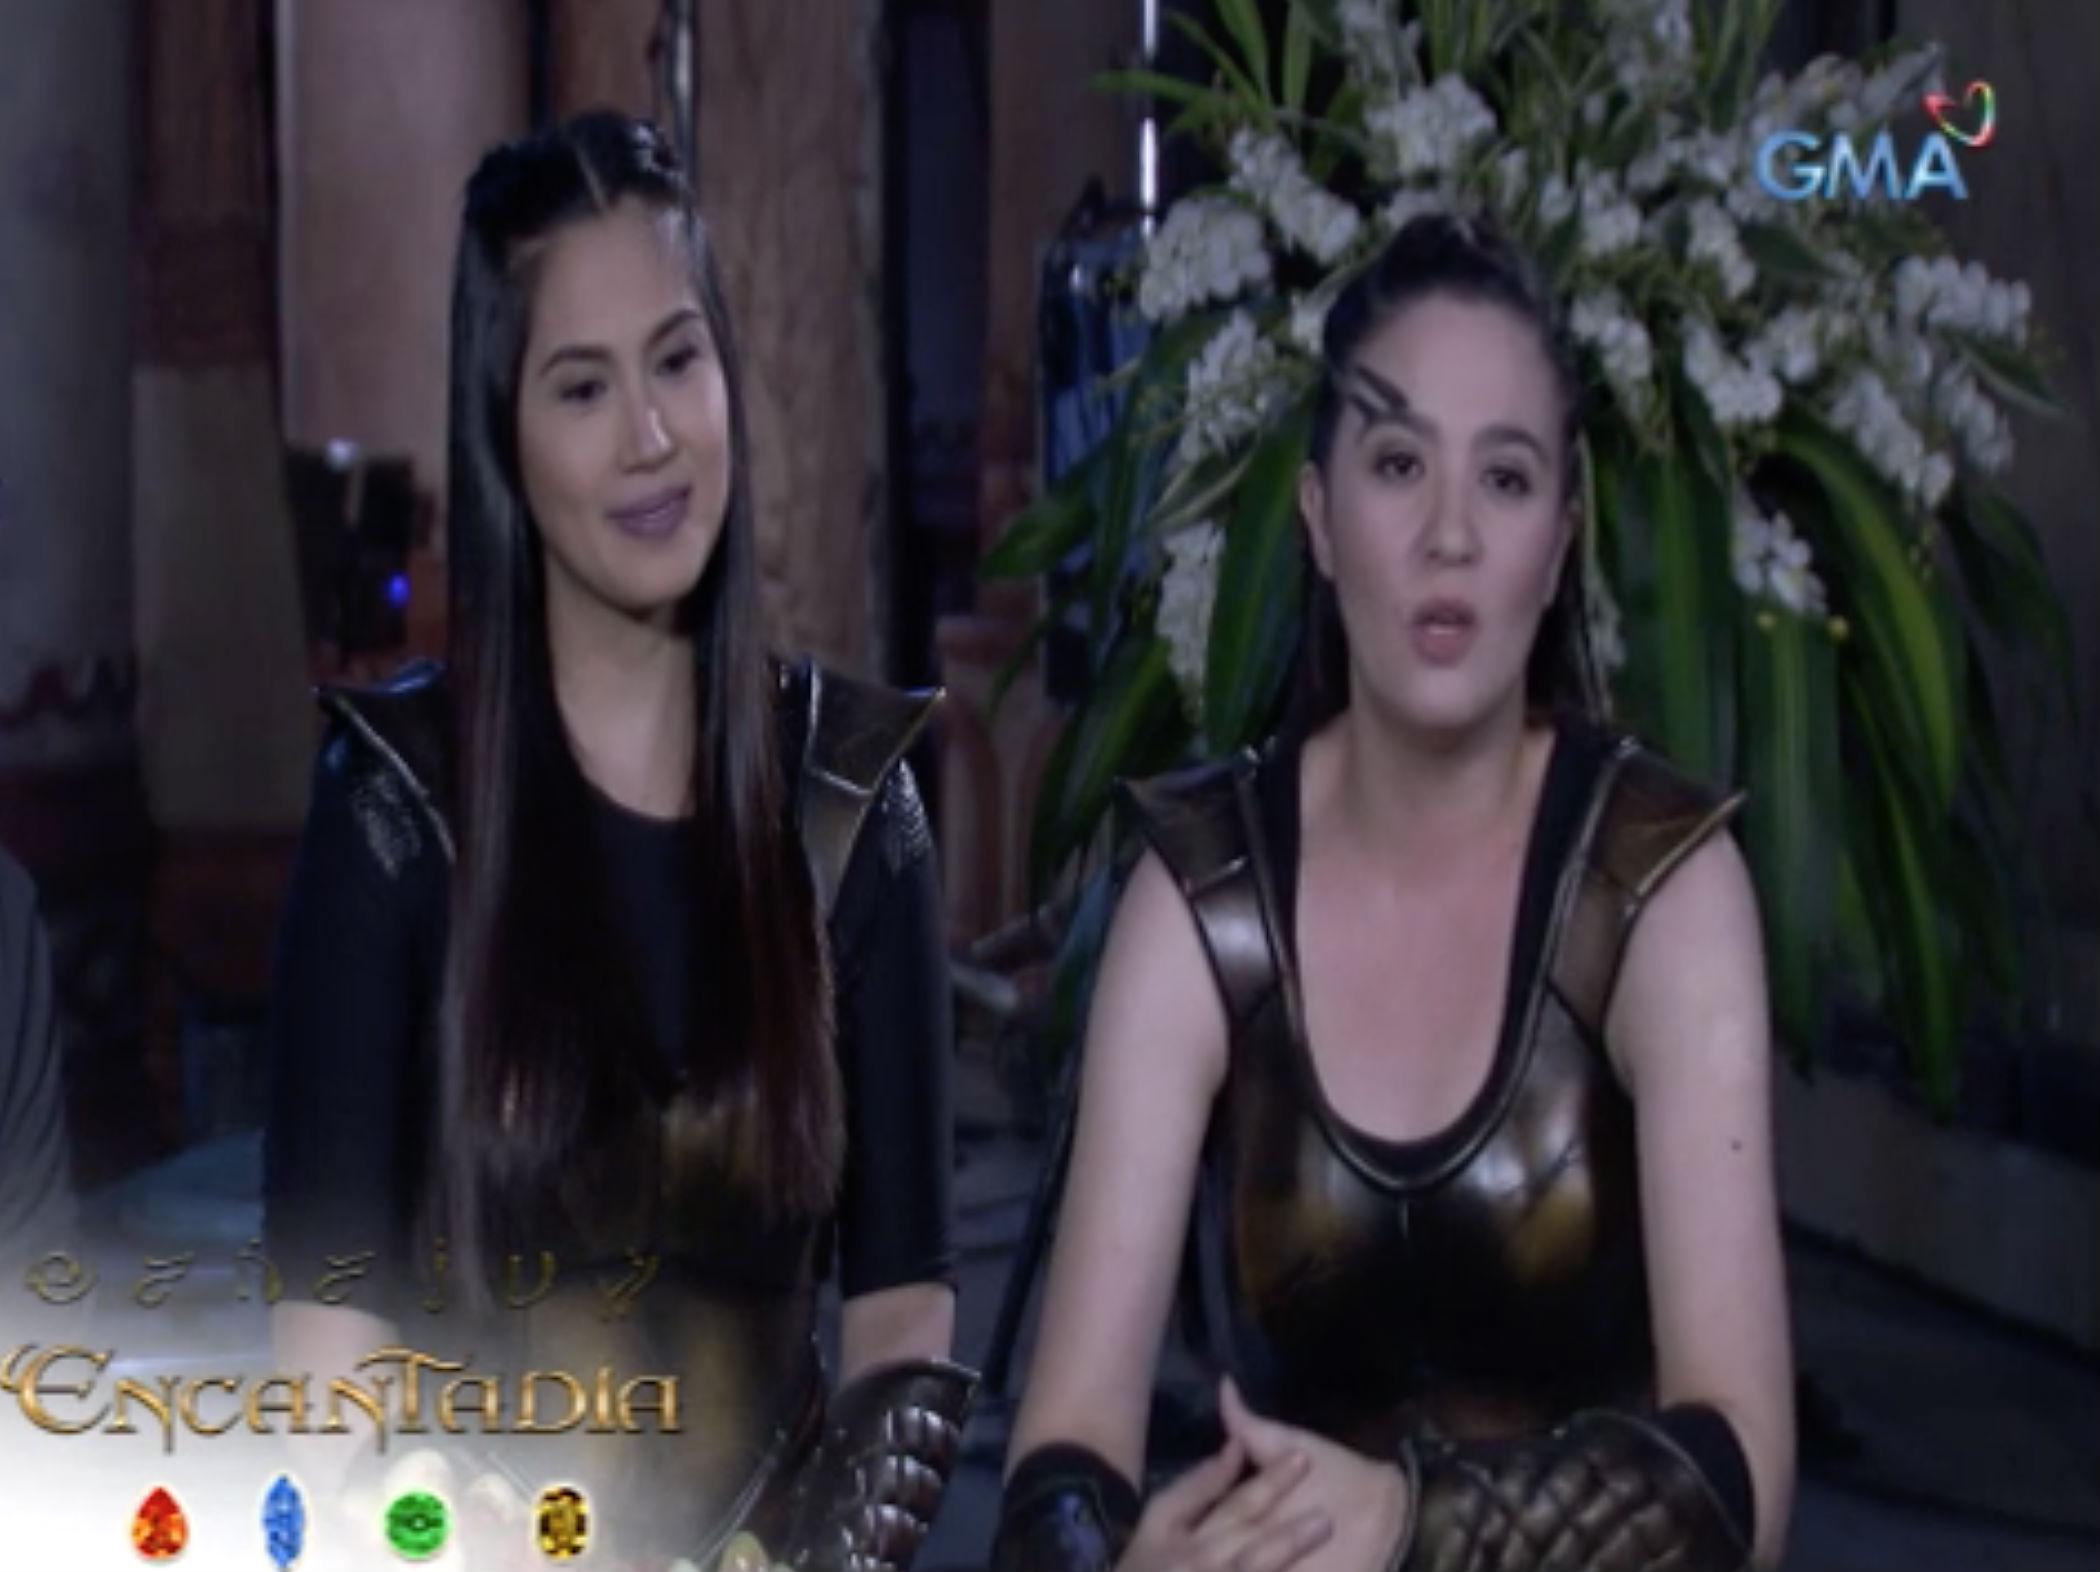 Sunshine Dizon and Diana Zubiri reunite in 'Encantadia' as Adhara and Lilasari. Sunshine originally played Pirena, while Diana played Danaya in the 2005 version of the show. Screengrab from GMA/Encantadia